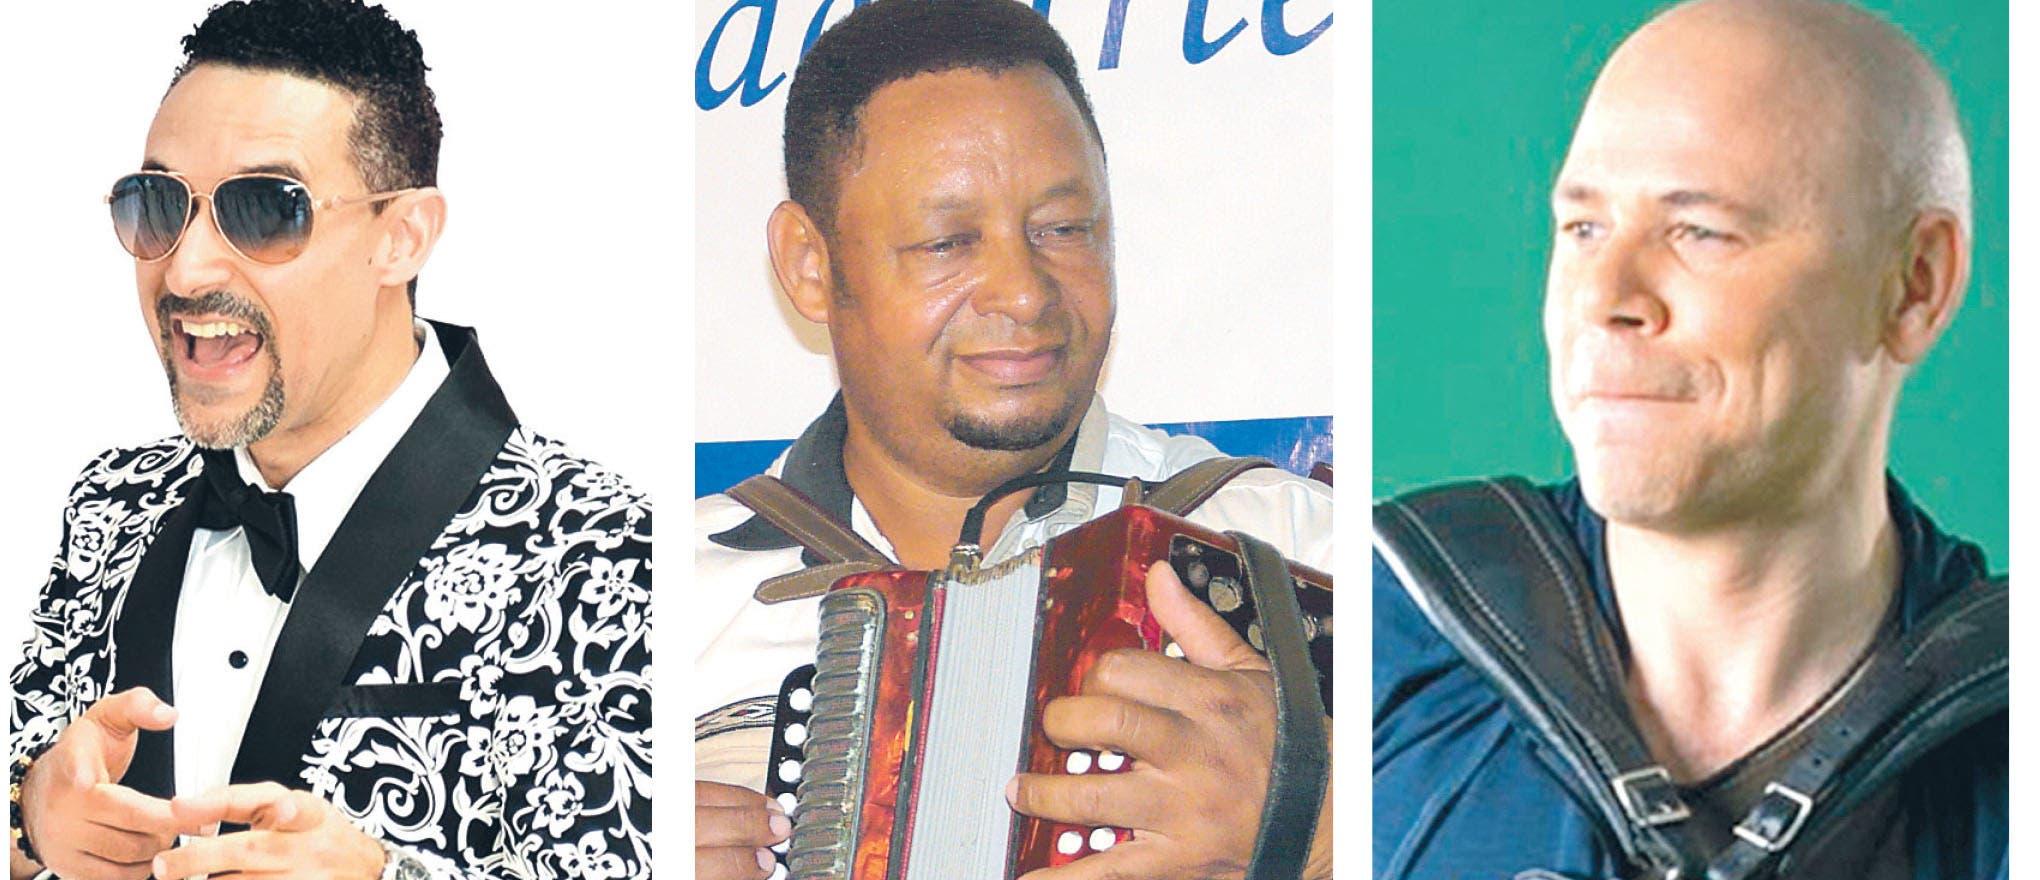 Música típica sigue en ascenso, pese al auge  de ritmos urbanos